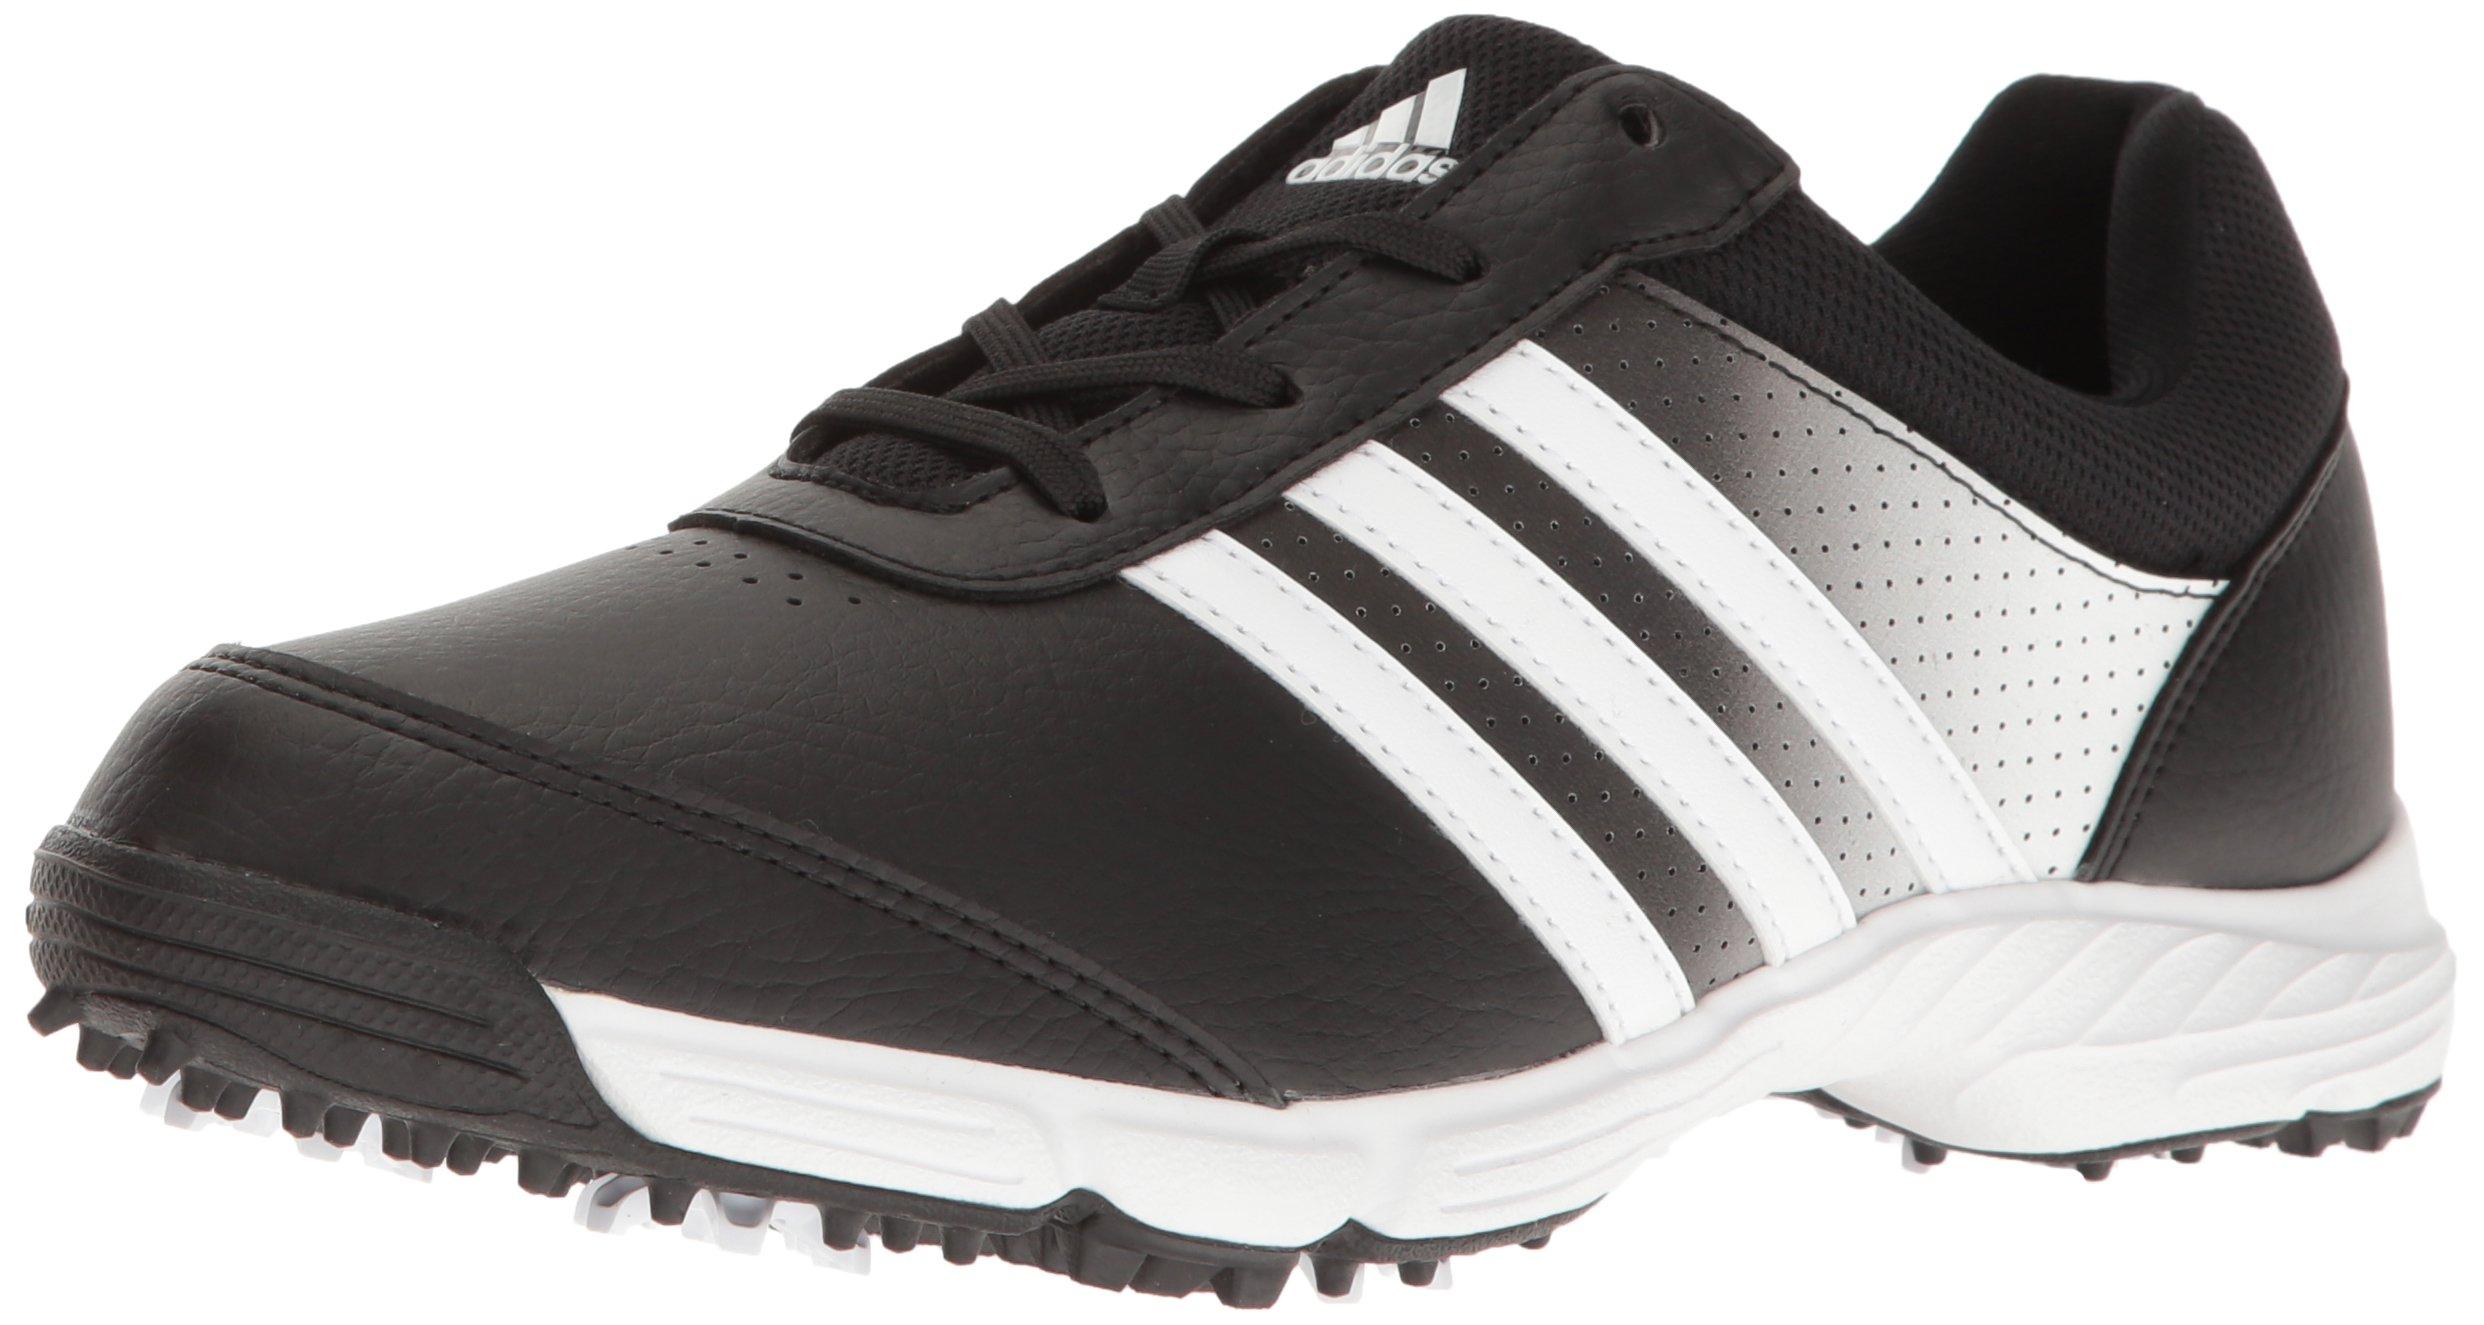 adidas Women's Tech Response Golf Shoe, Black, 6 M US by adidas